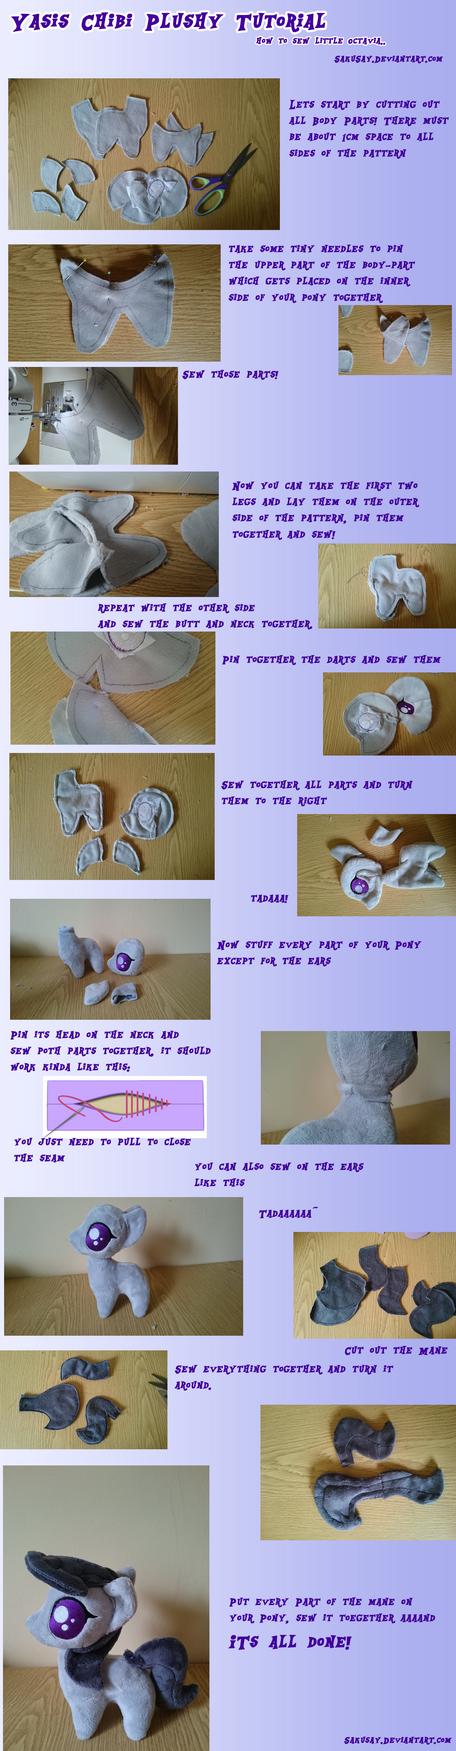 Yasis How to plush a Chibi Octavia Tutorial by SakuSay